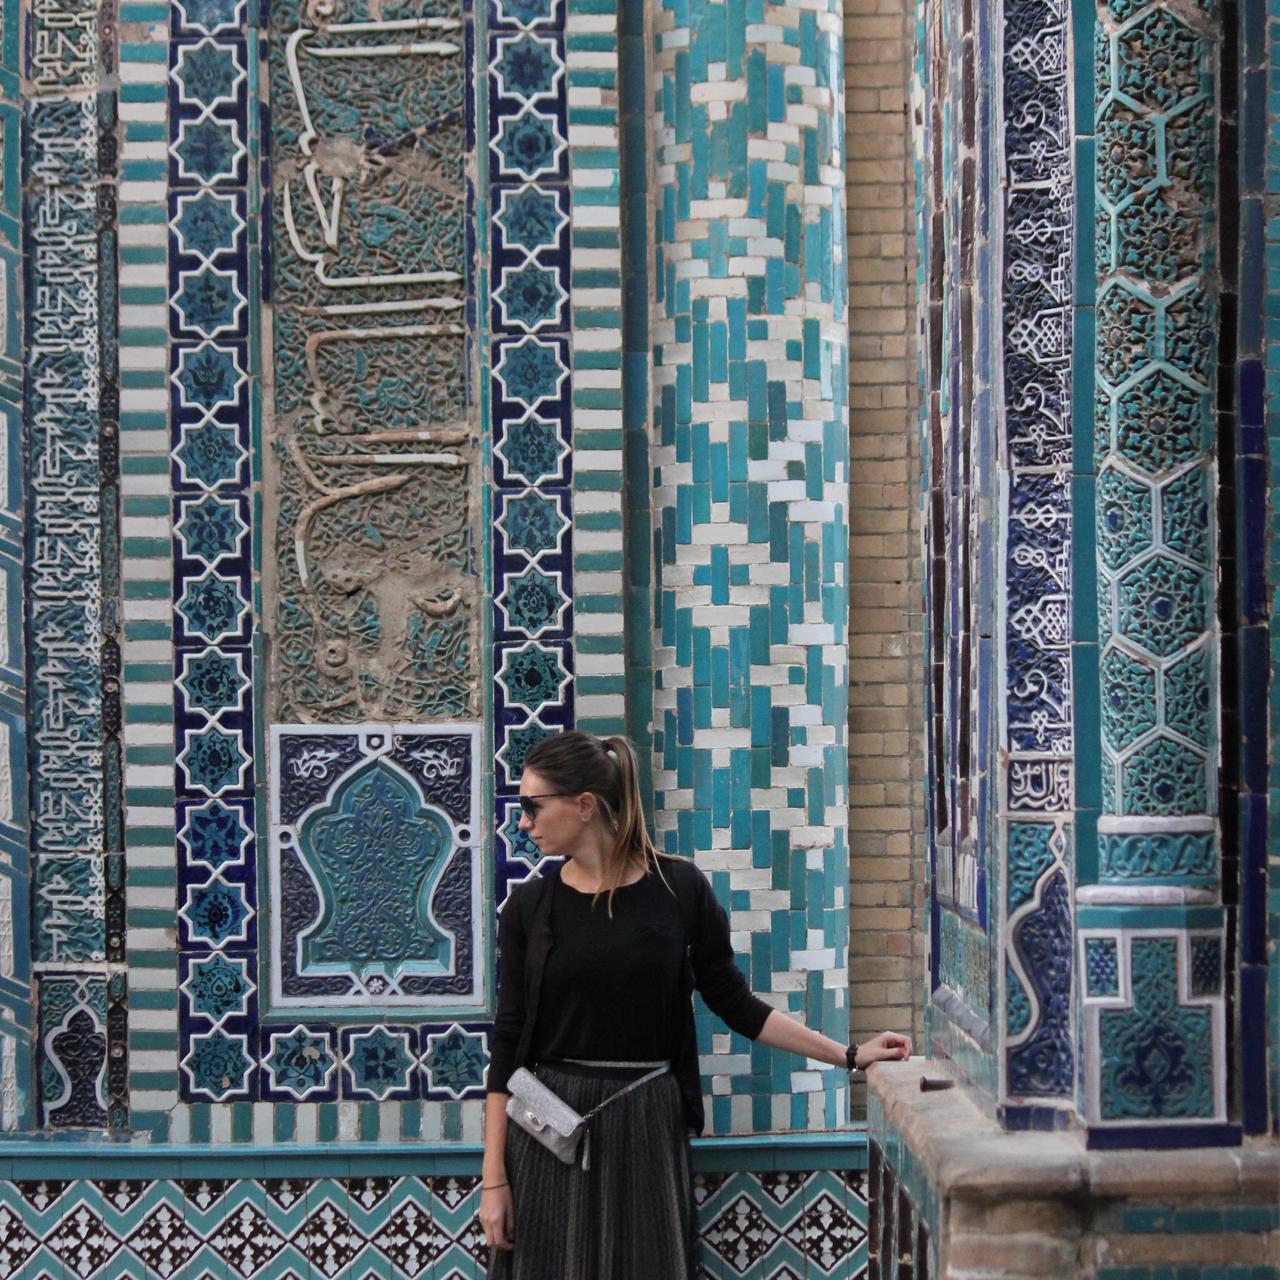 samarkand, uzbekistan - 24